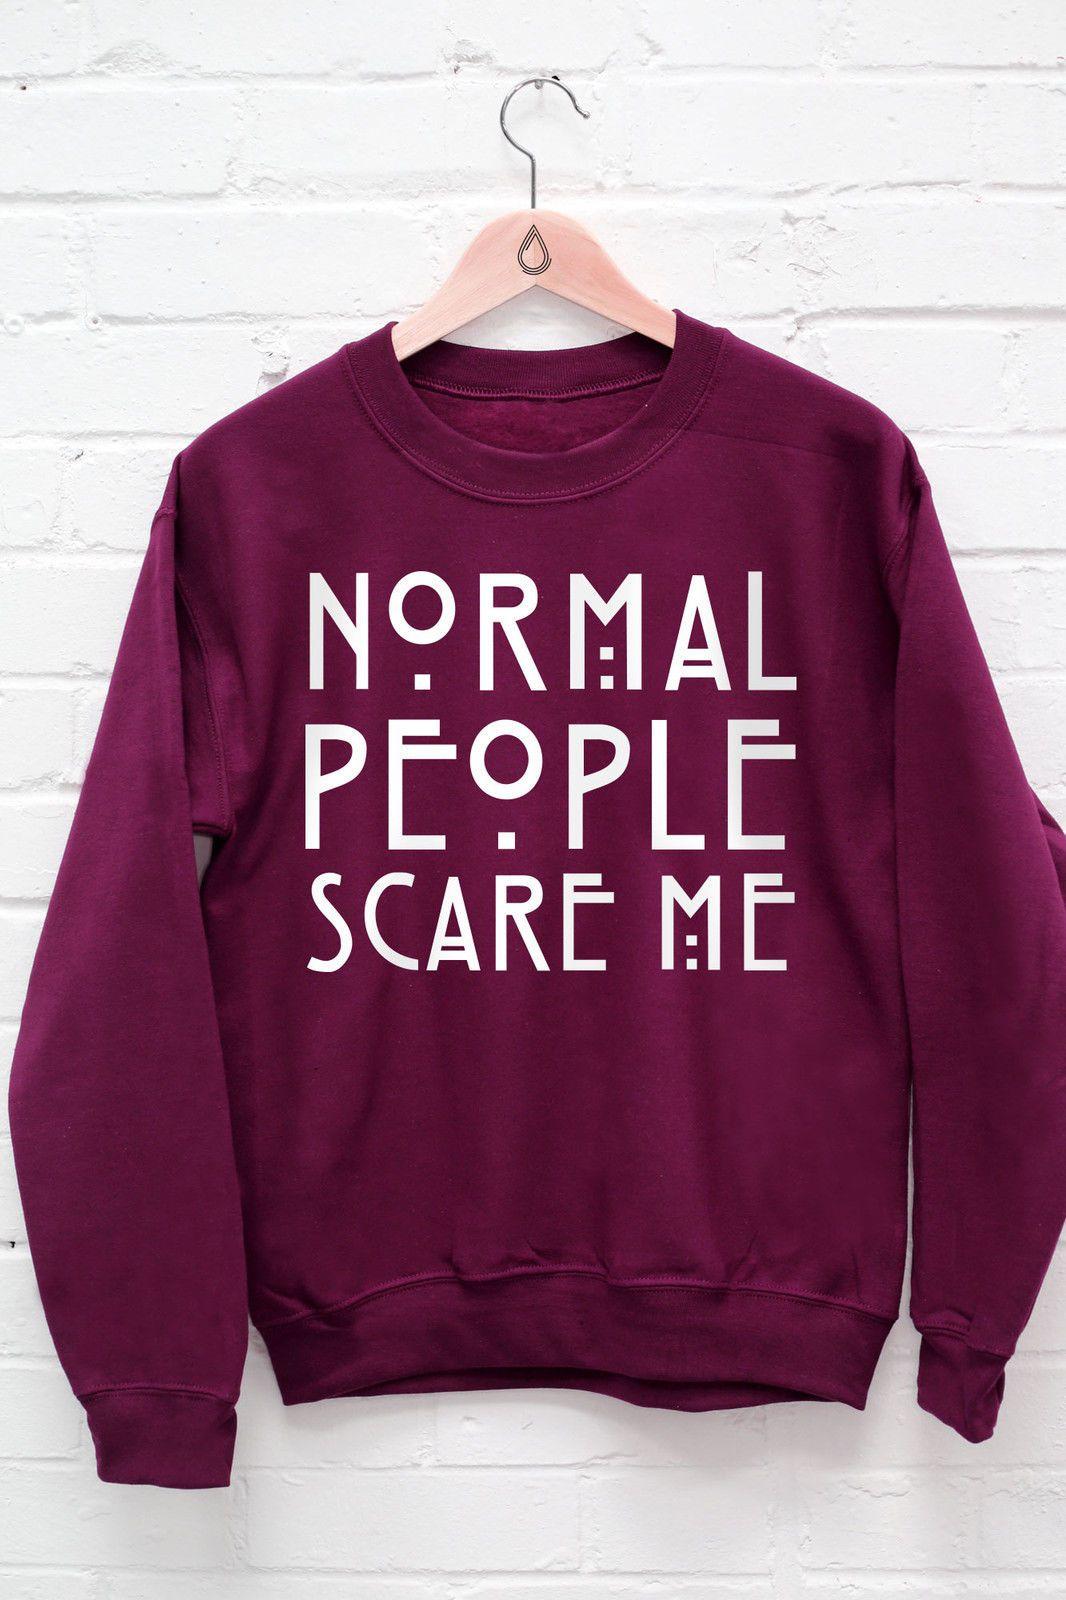 Ebay American Horror Story Shirt Tumblr Wwwmiifotoscom